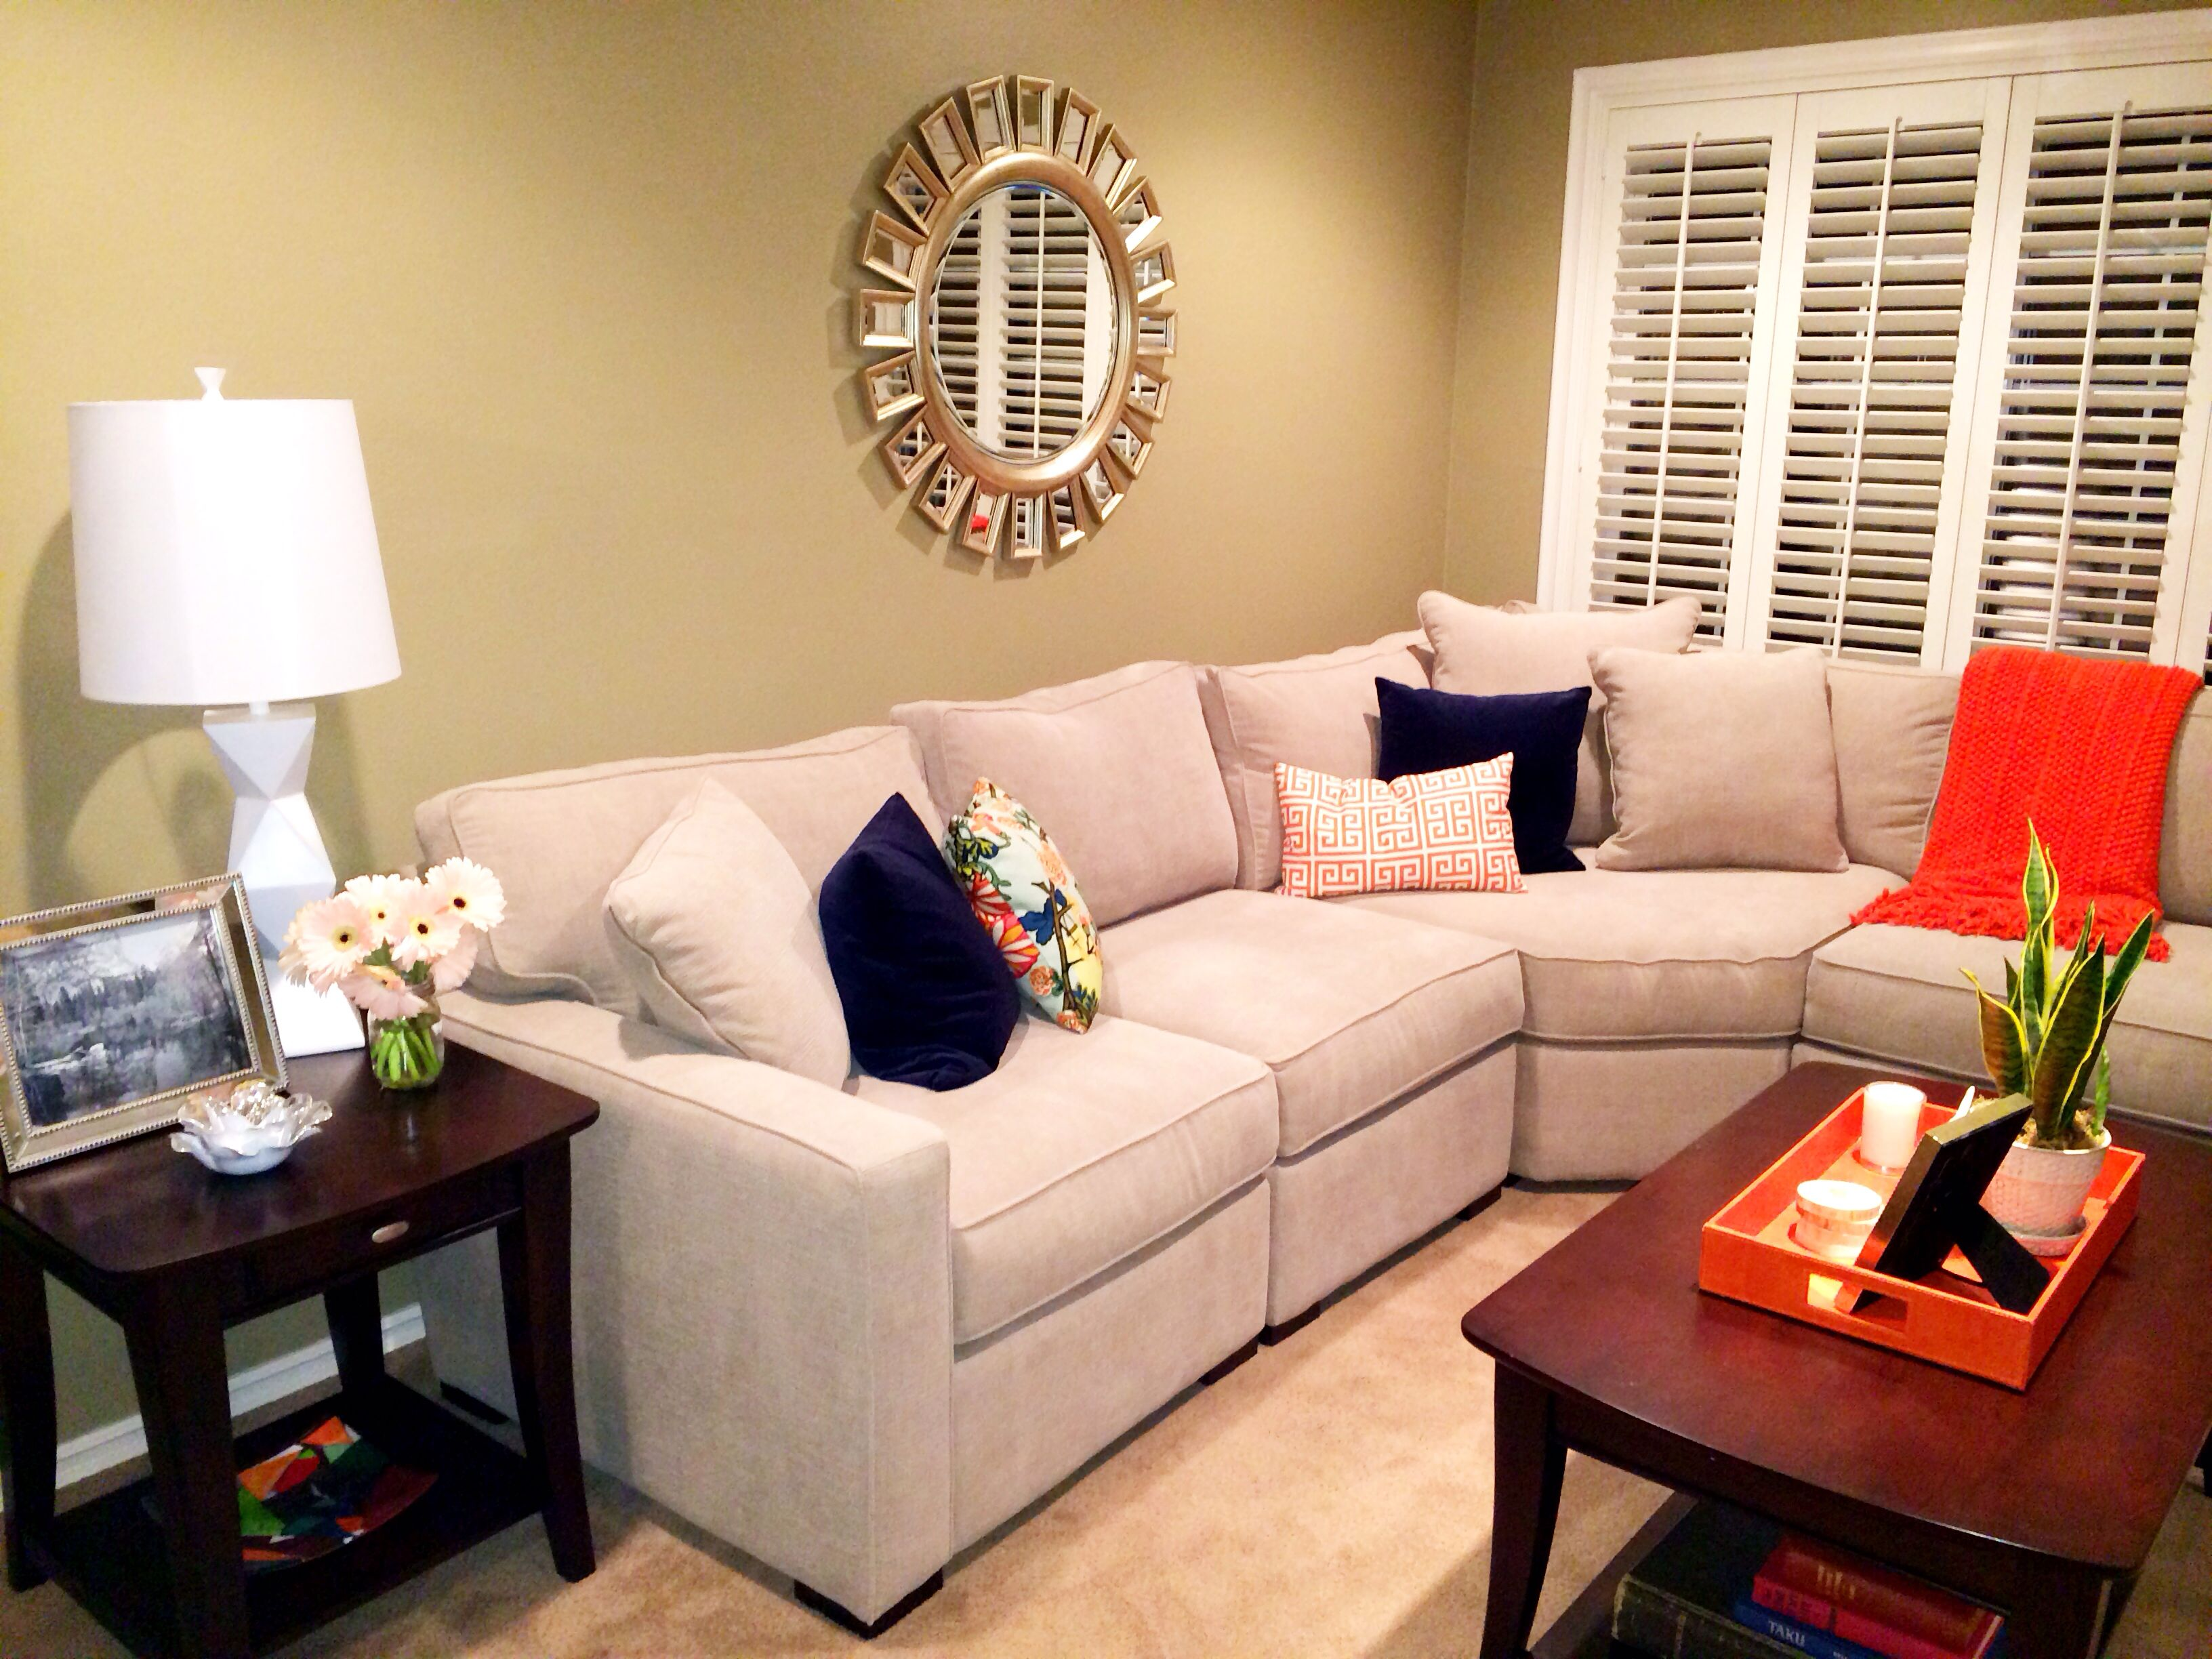 Macys Sofa Pillows Harga Bed Murah Jakarta Living Room In Progress Radley Sectional From Macy 39s